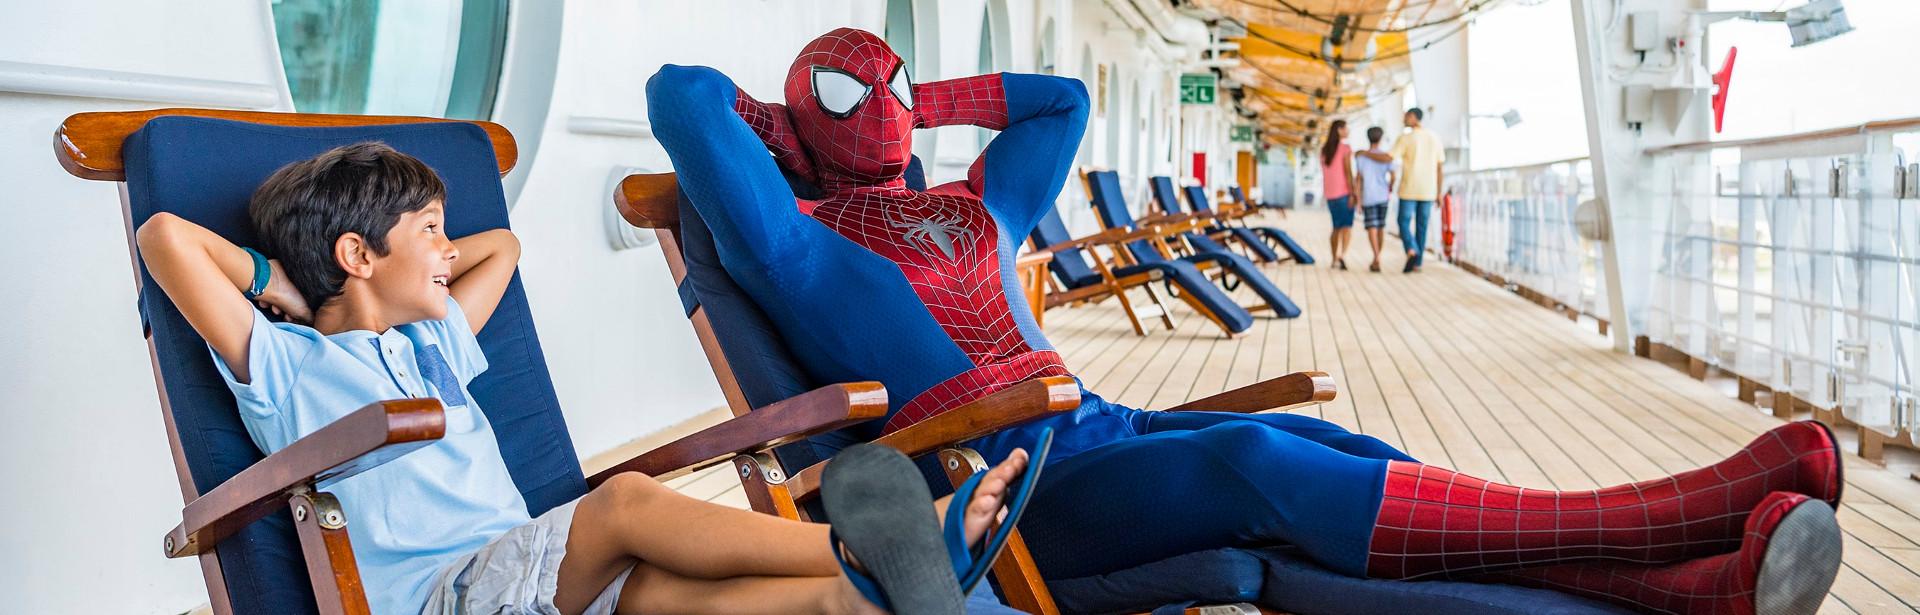 Marvel e Star Wars Day at Sea